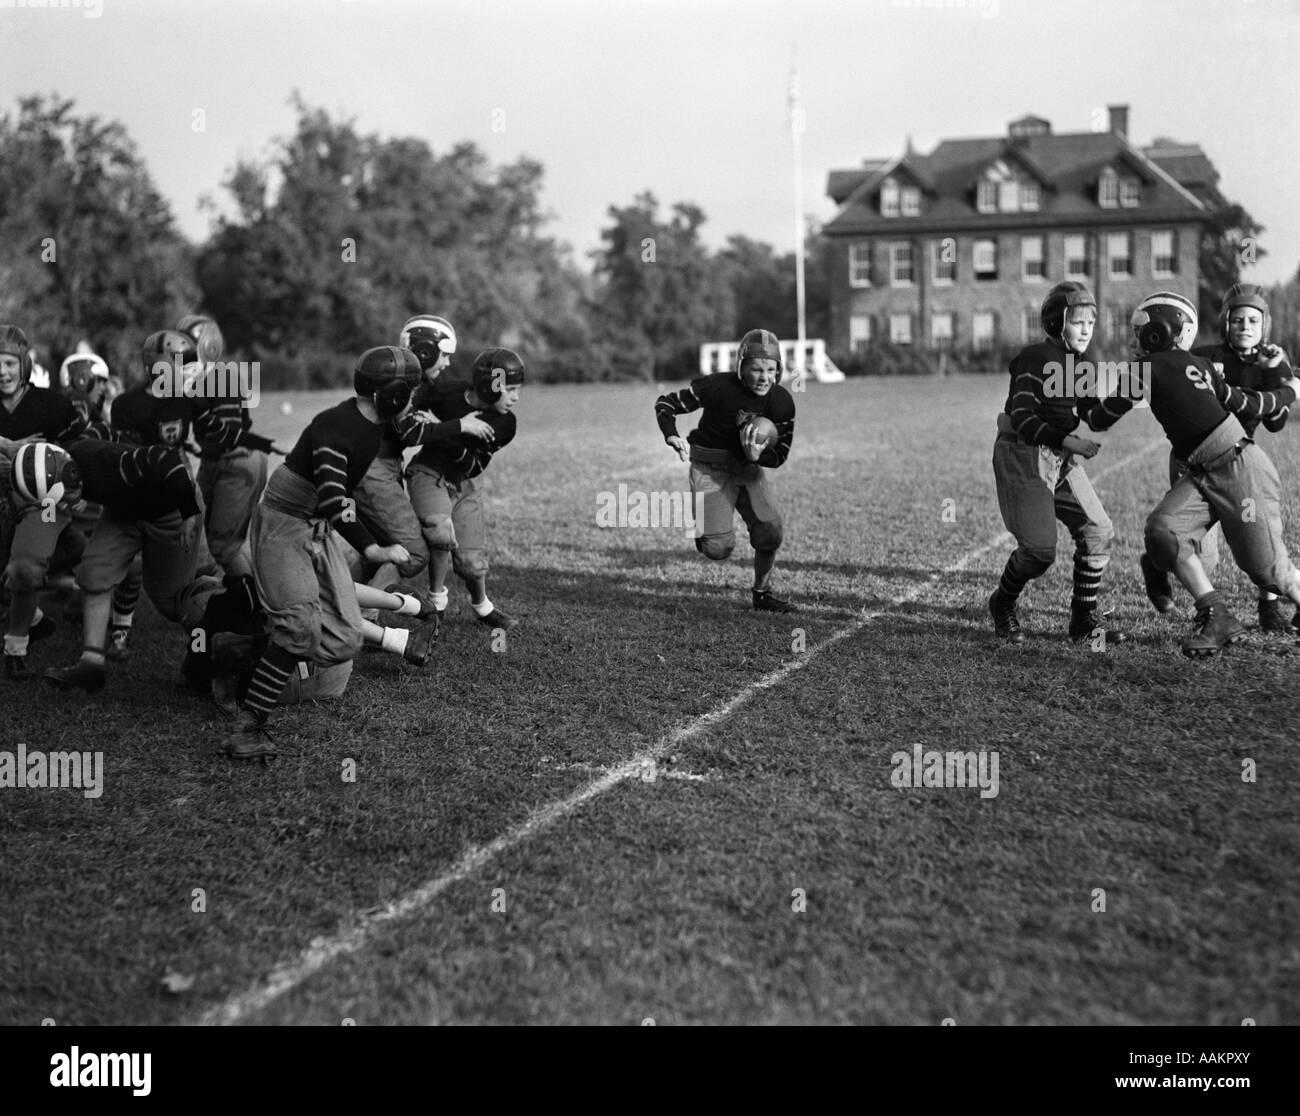 1930s BOYS SCHOOL FOOTBALL TEAM BOY RUNNING WITH BALL CENTER - Stock Image